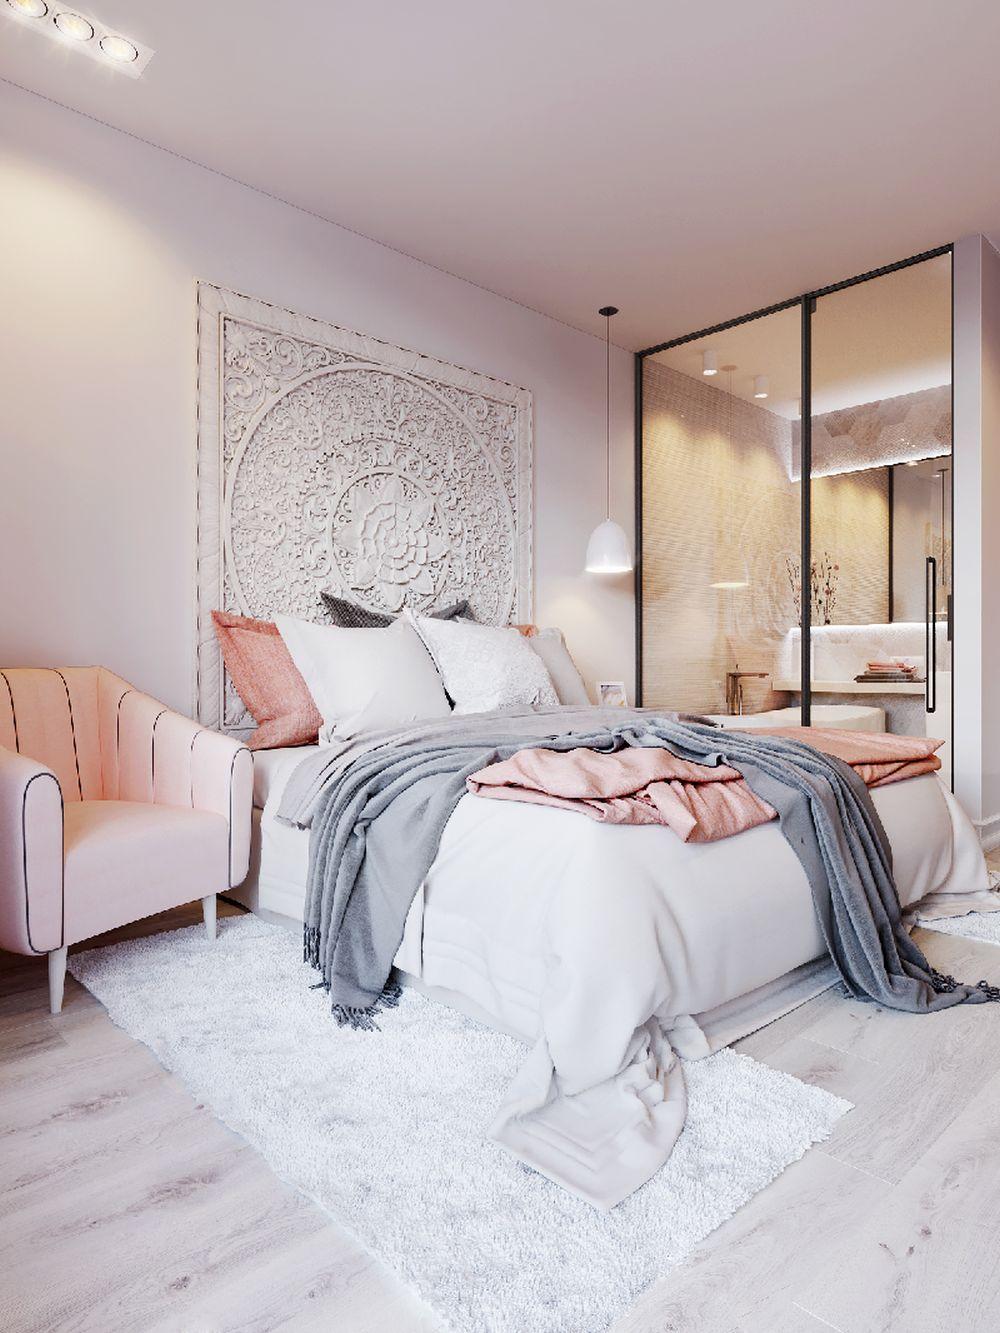 adelaparvu.com despre apartament in nuante delicate, designer Dima Kravtsov (14)